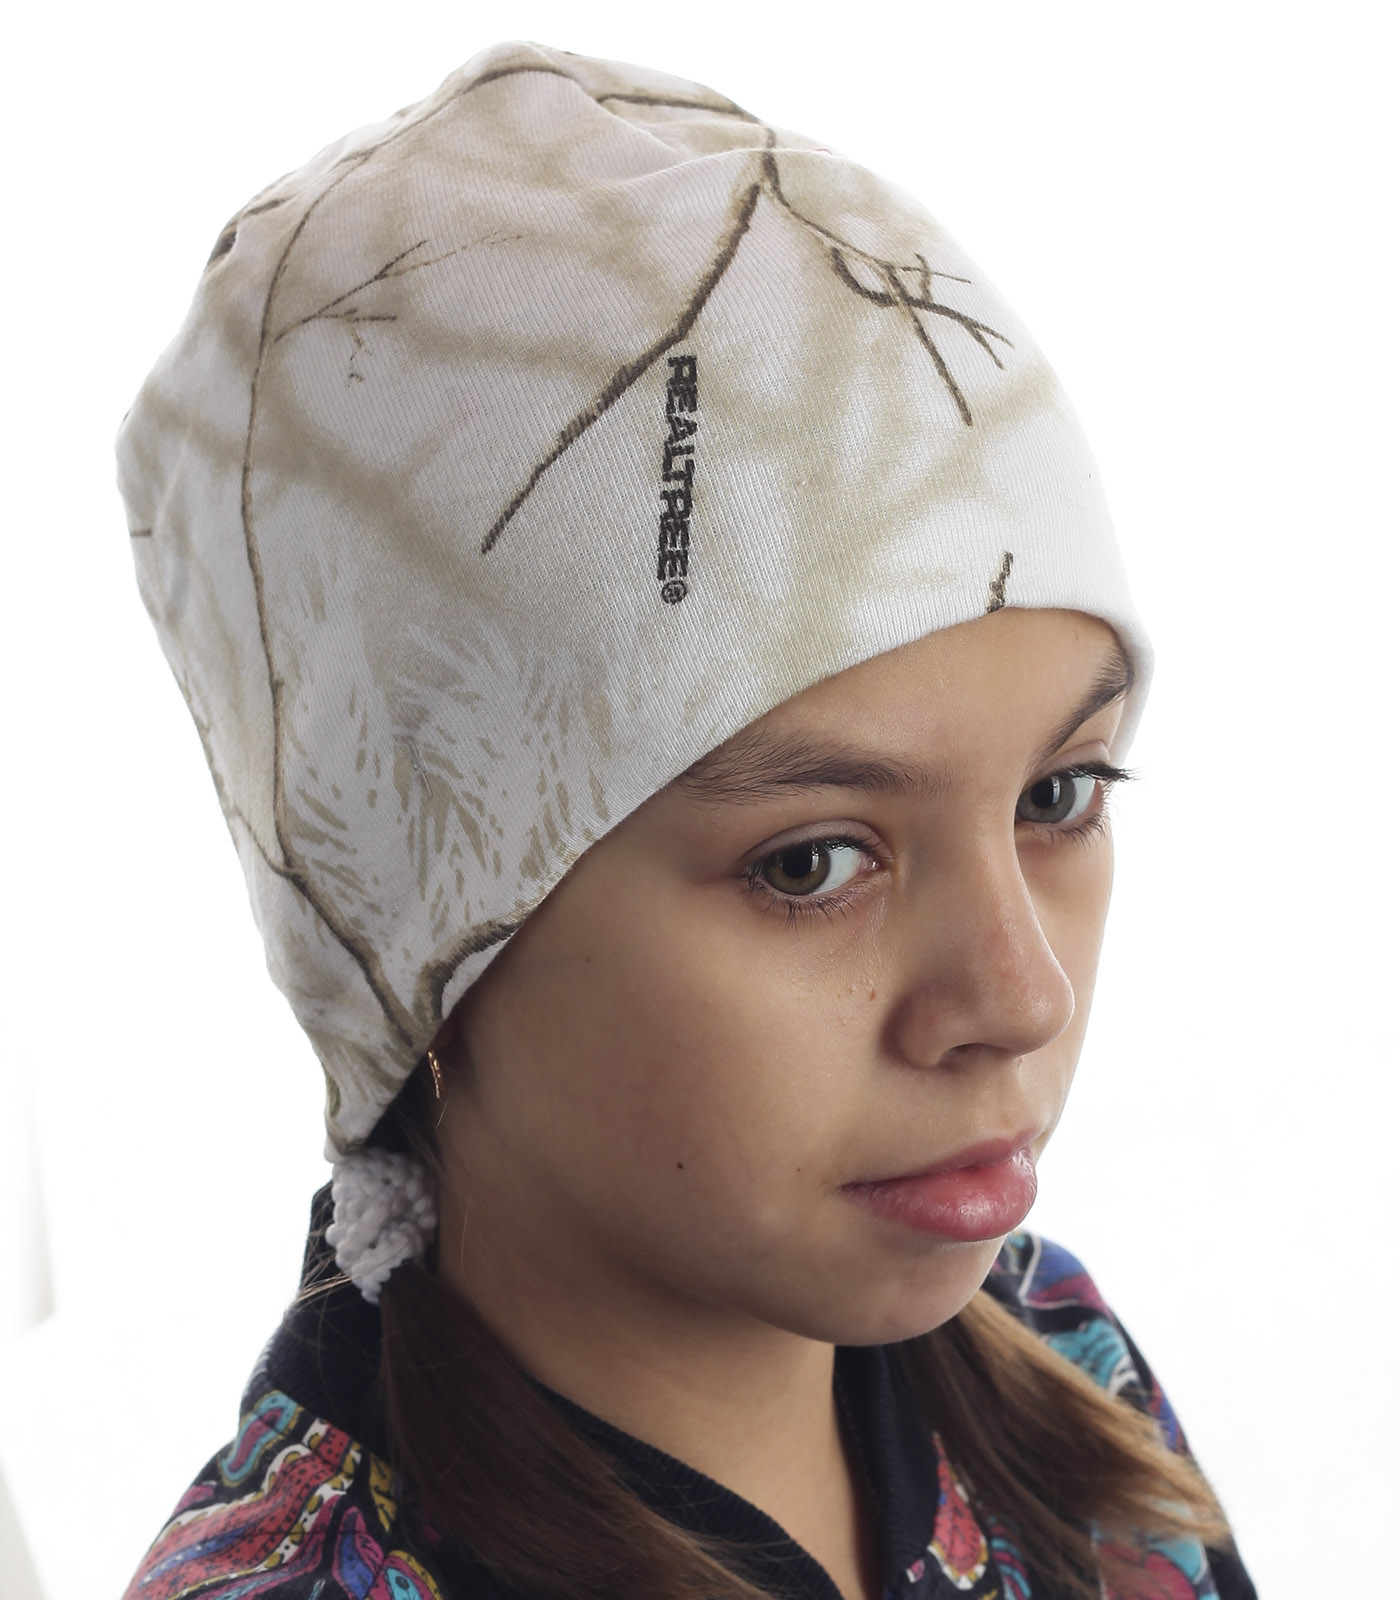 Теплая детская шапочка за 100 рублей